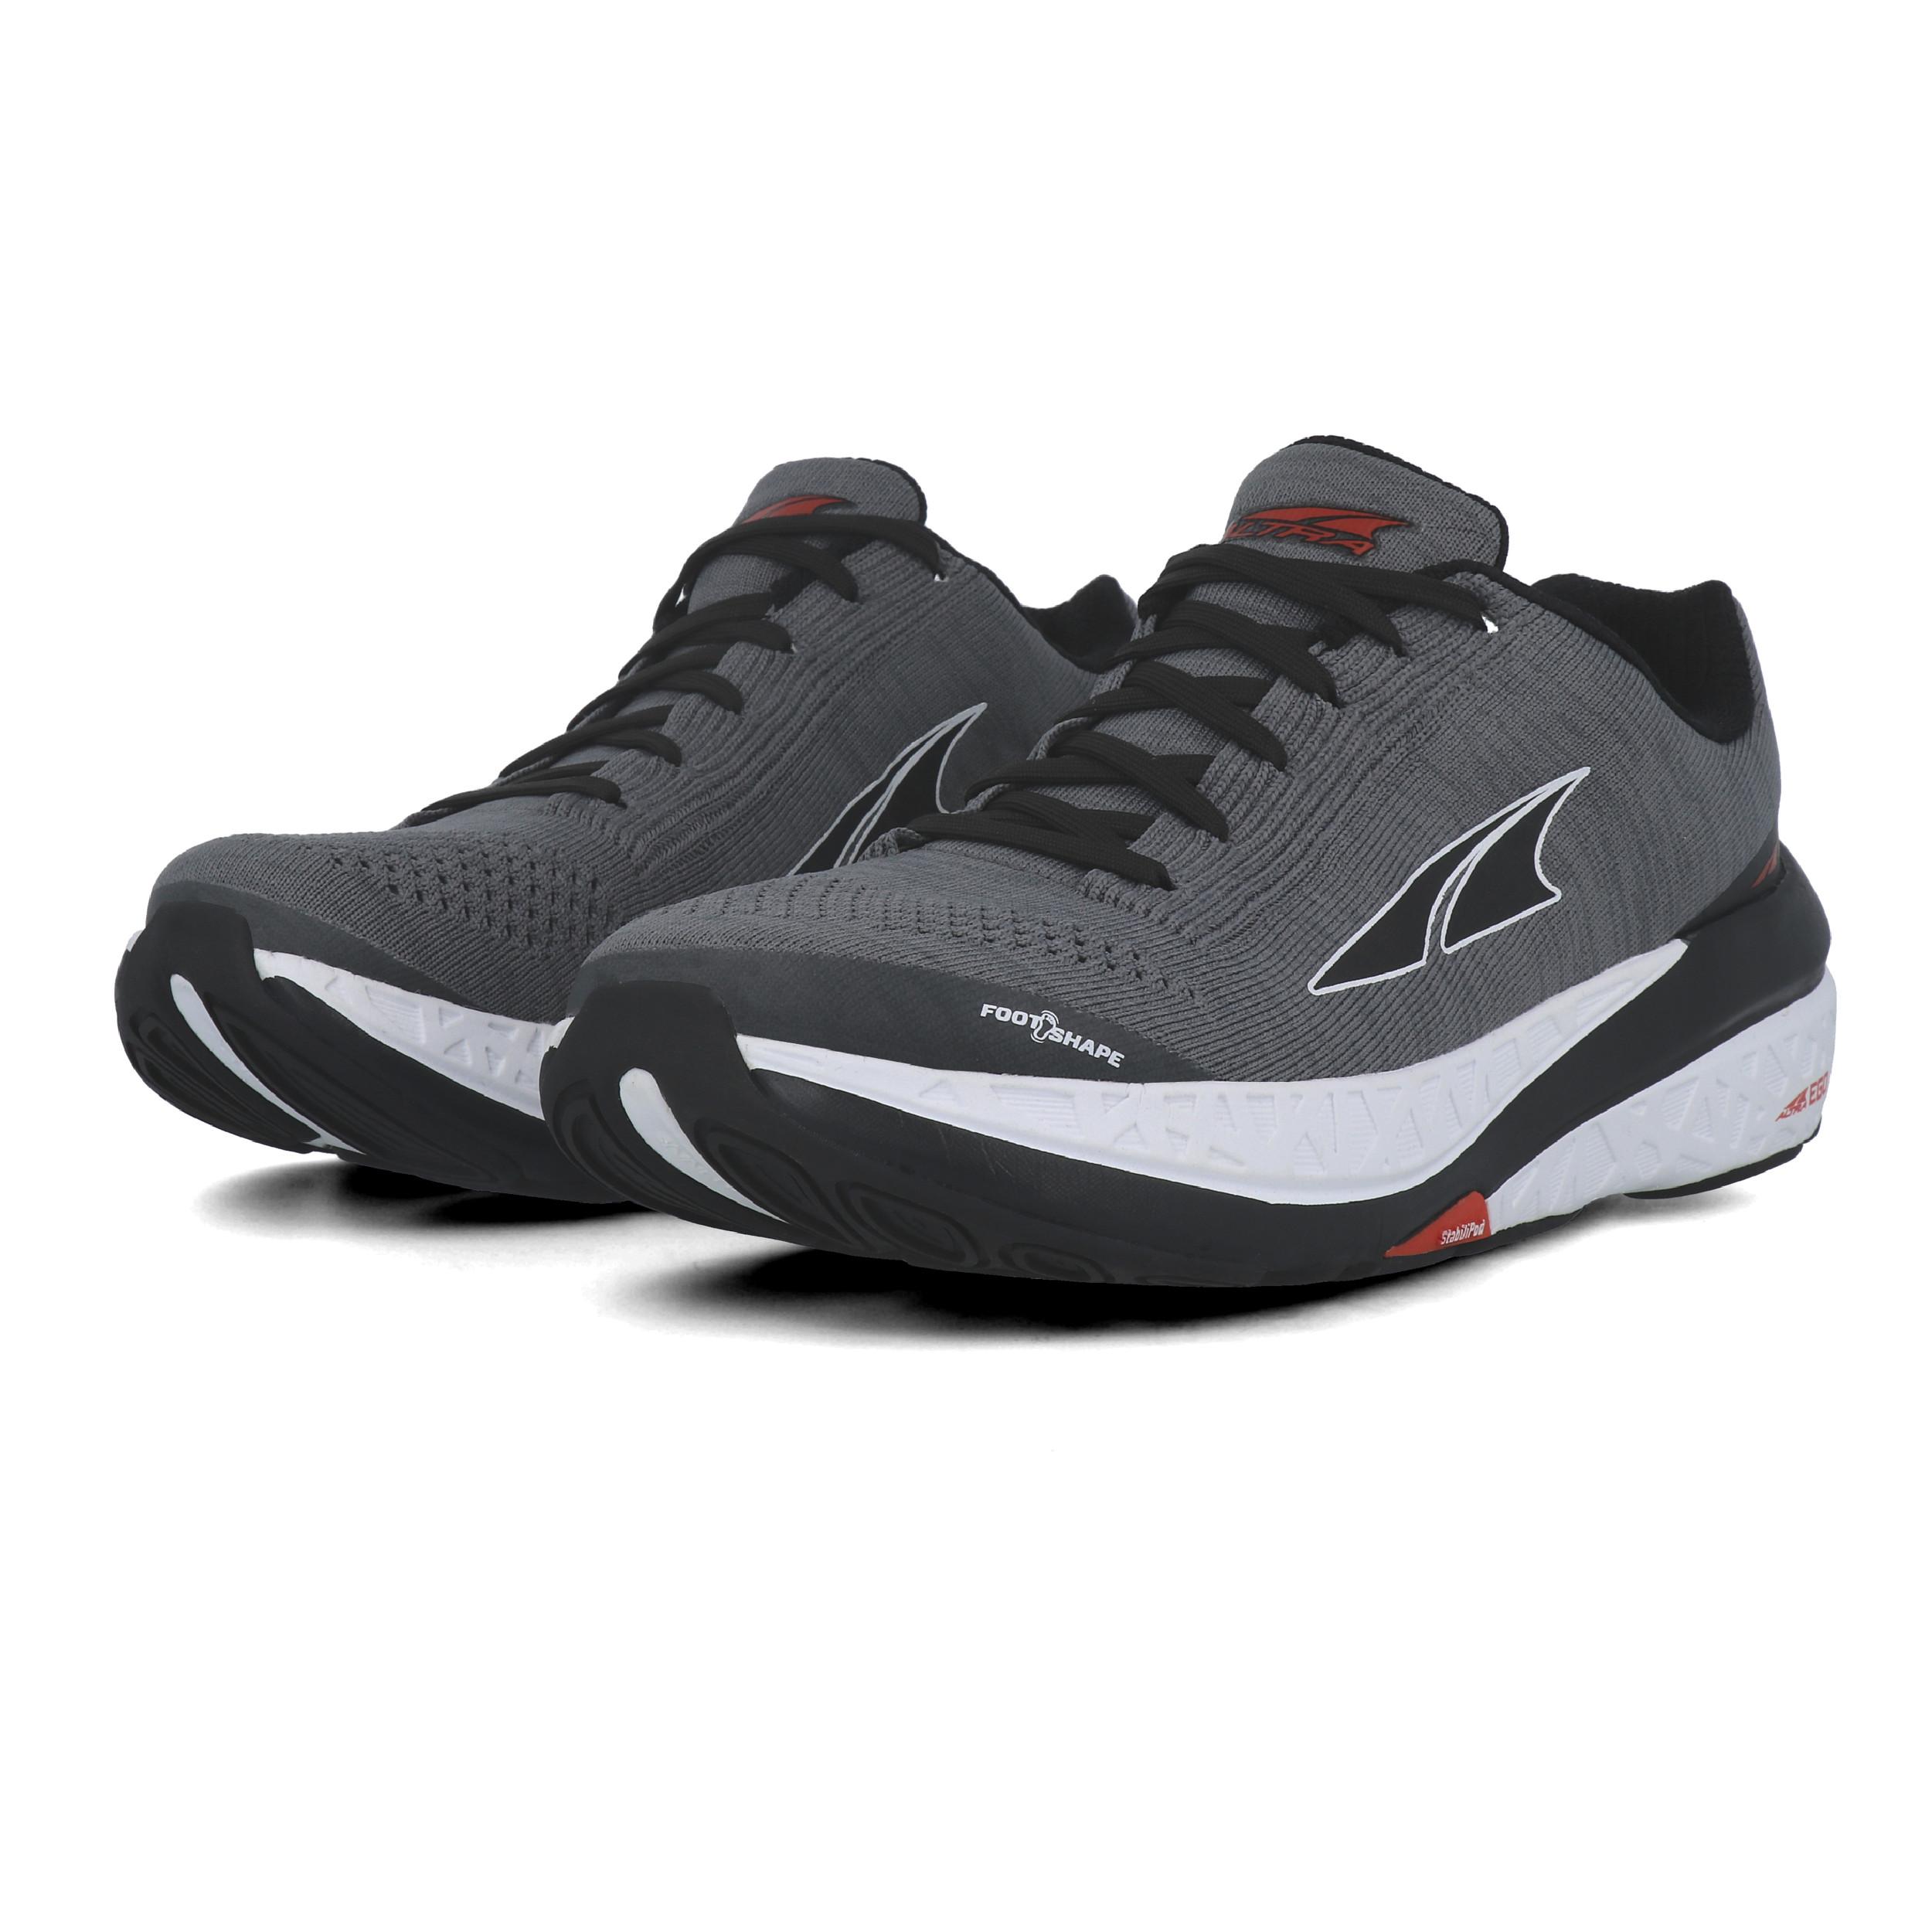 Altra - Paradigm 4.5 | cycling shoes